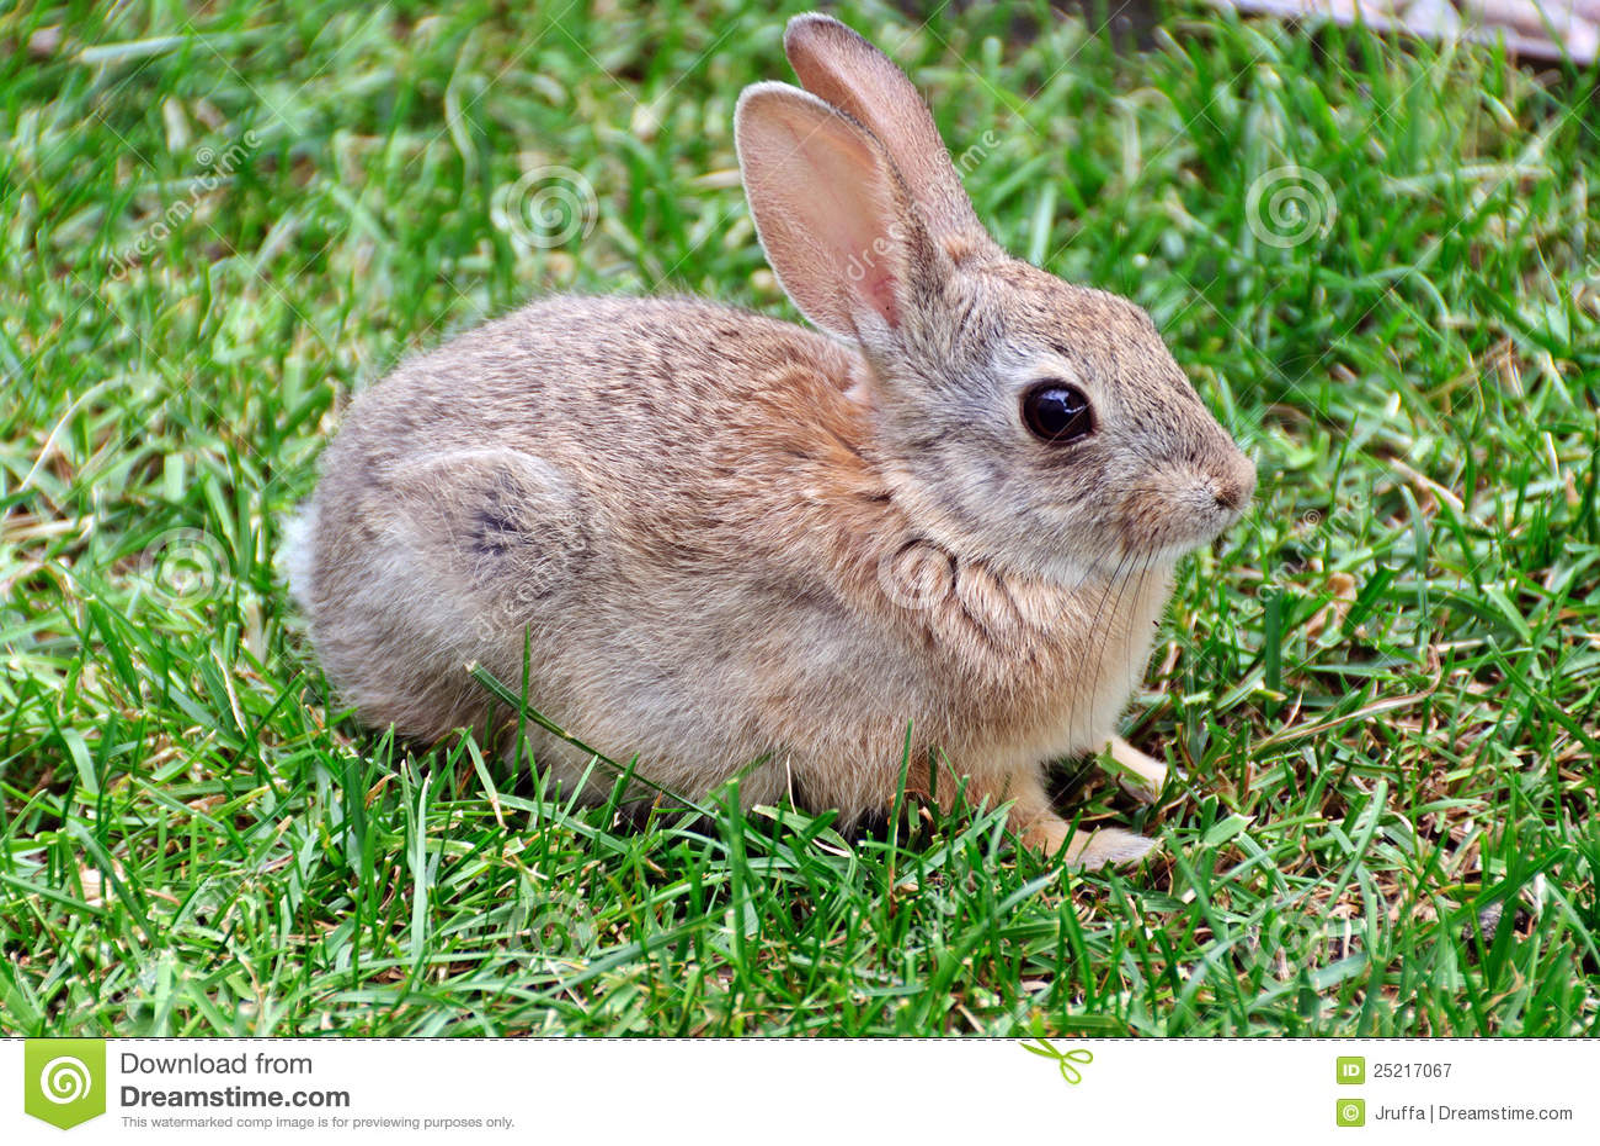 Bunny Rabbit Royalty Free Stock Photography - Image: 25217067